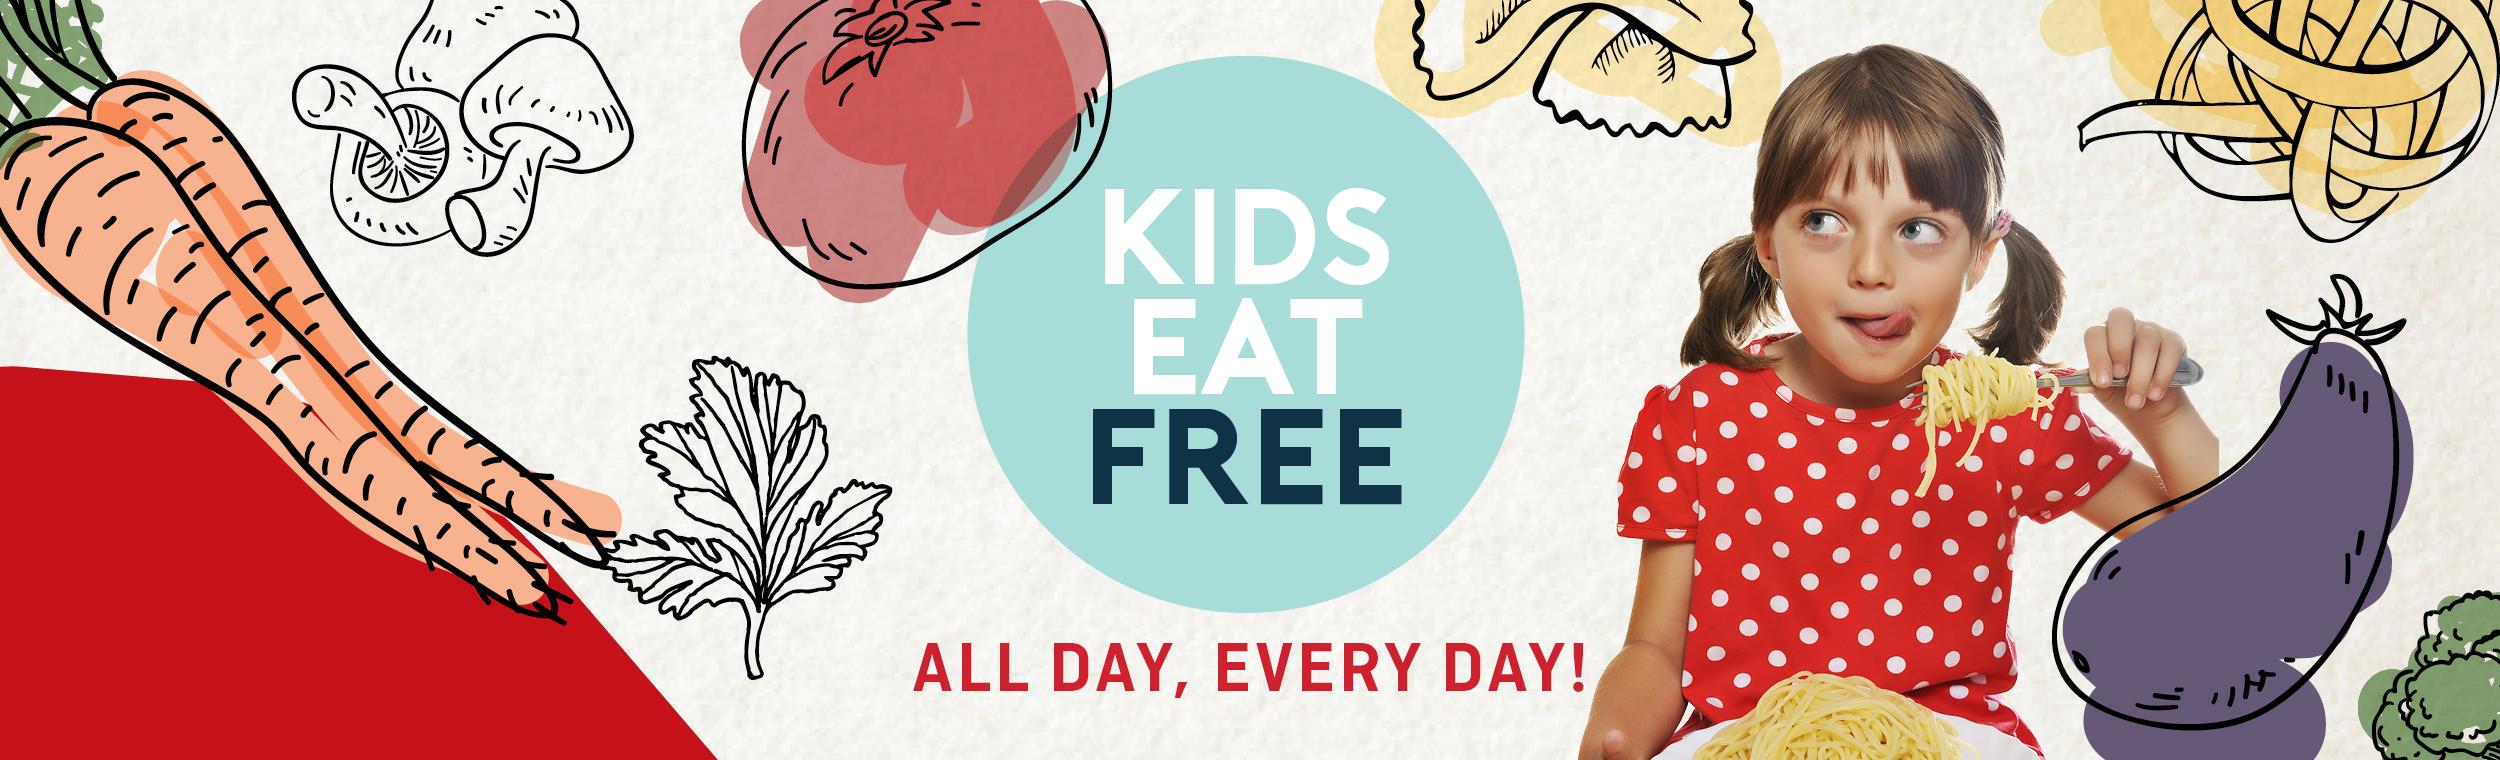 FF_Kids-Eat-Free-banner.jpg